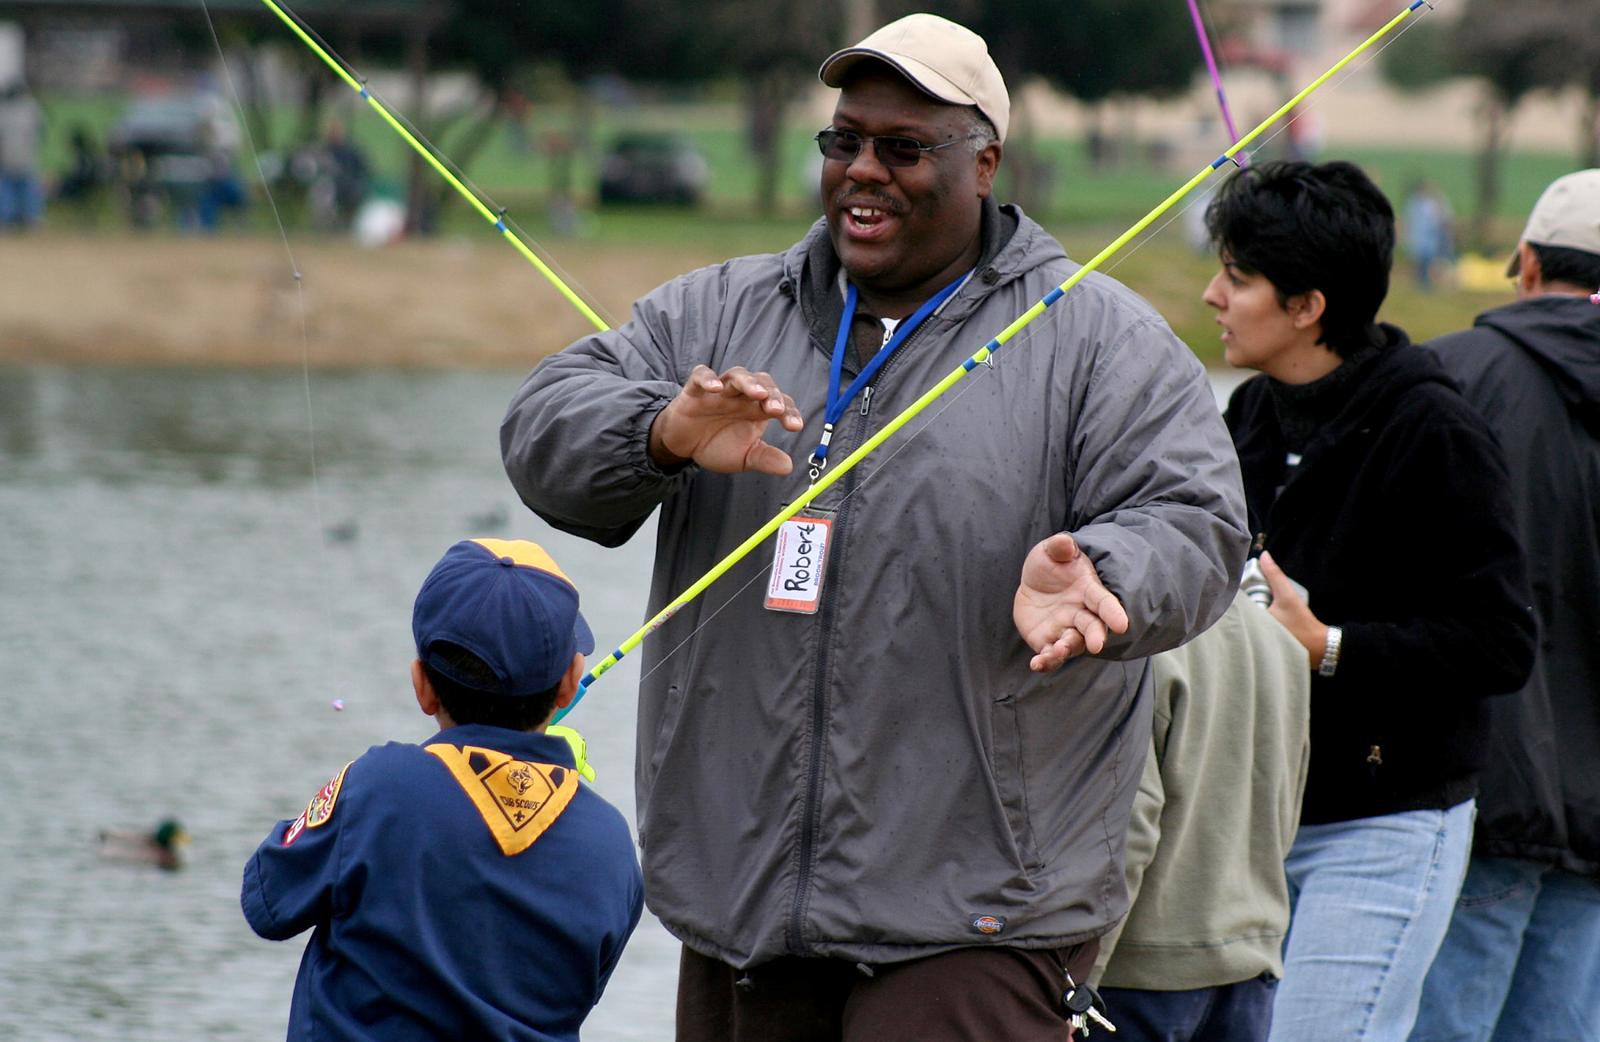 Man helping children fish at Guasti park.